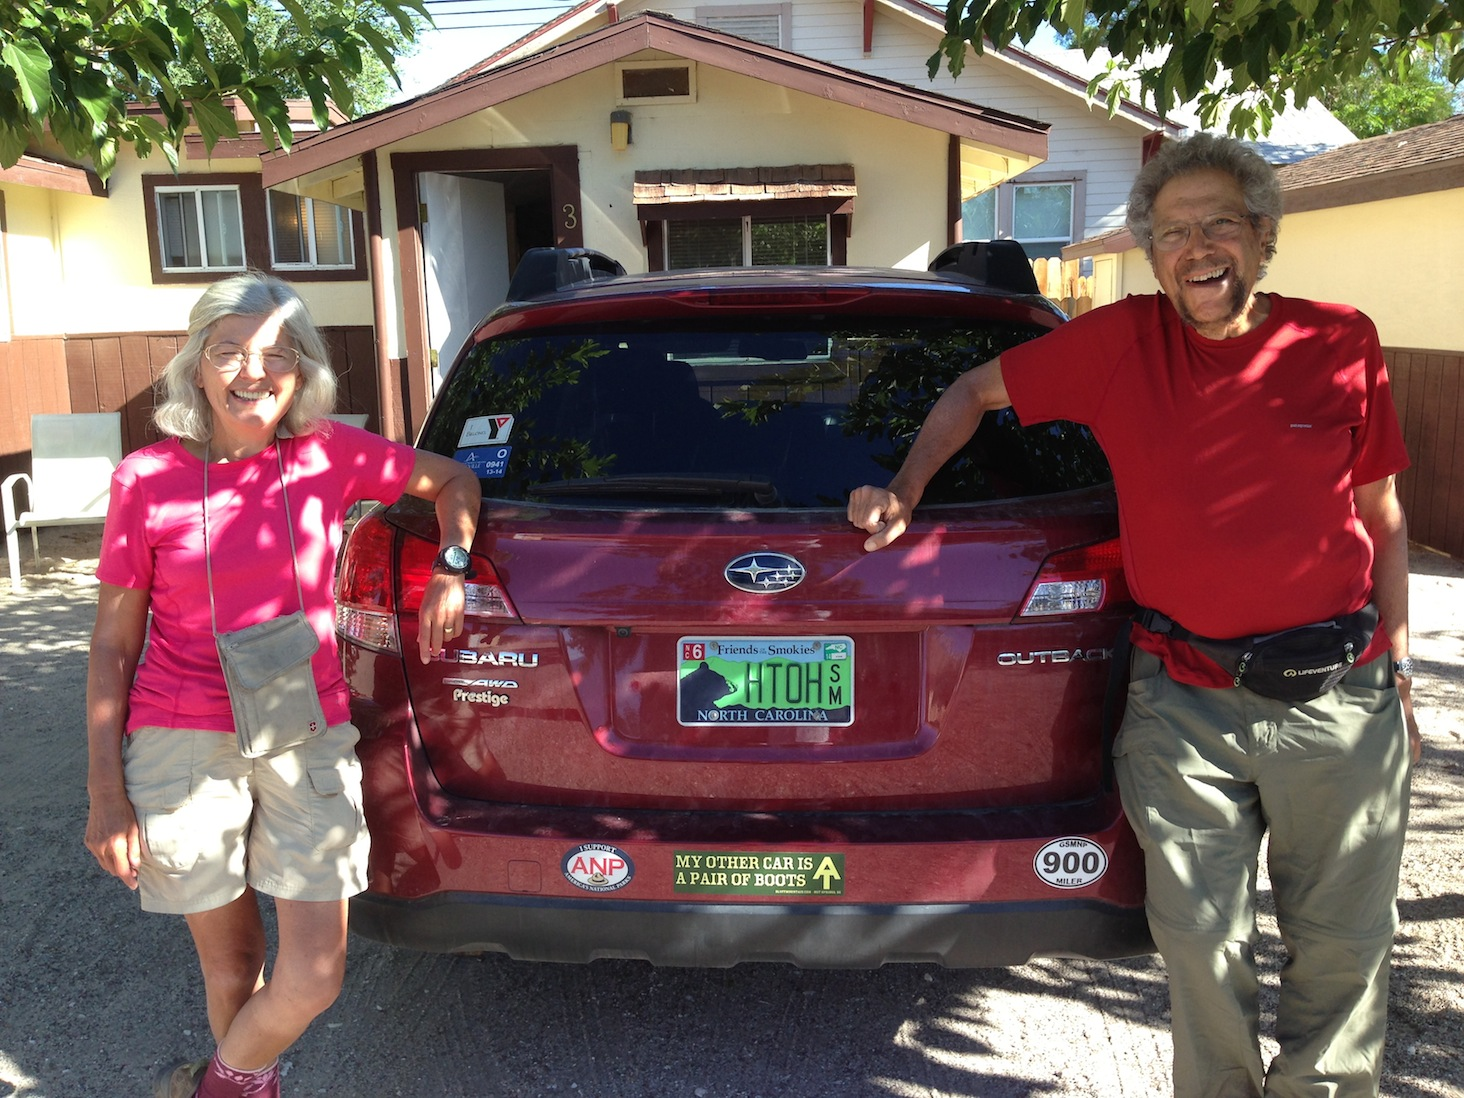 Base Camp: North Carolina hiking gurus Danny and Lenny Bernstein on June 22